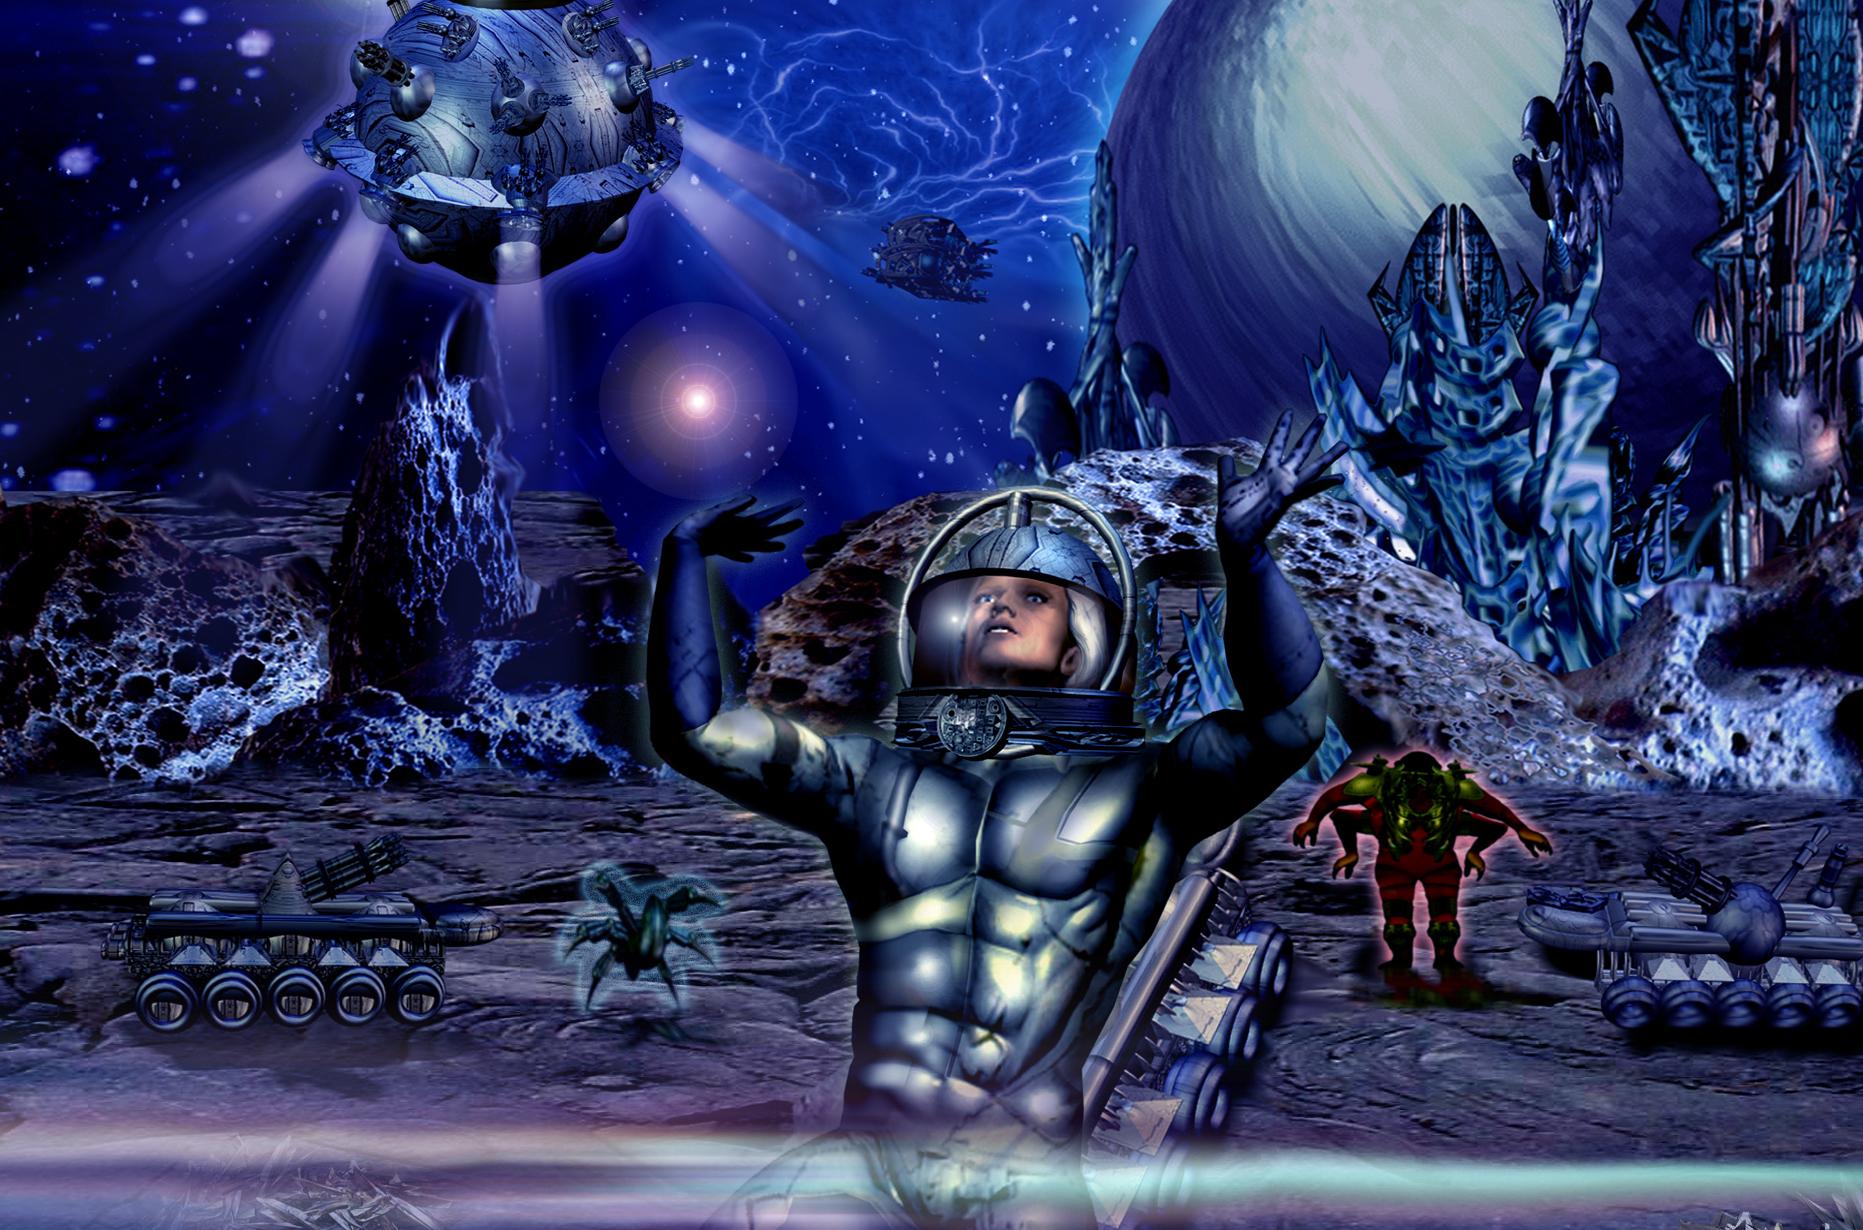 Atlan und Icho Tolot in der Galaxie Manjardon © John Buurman